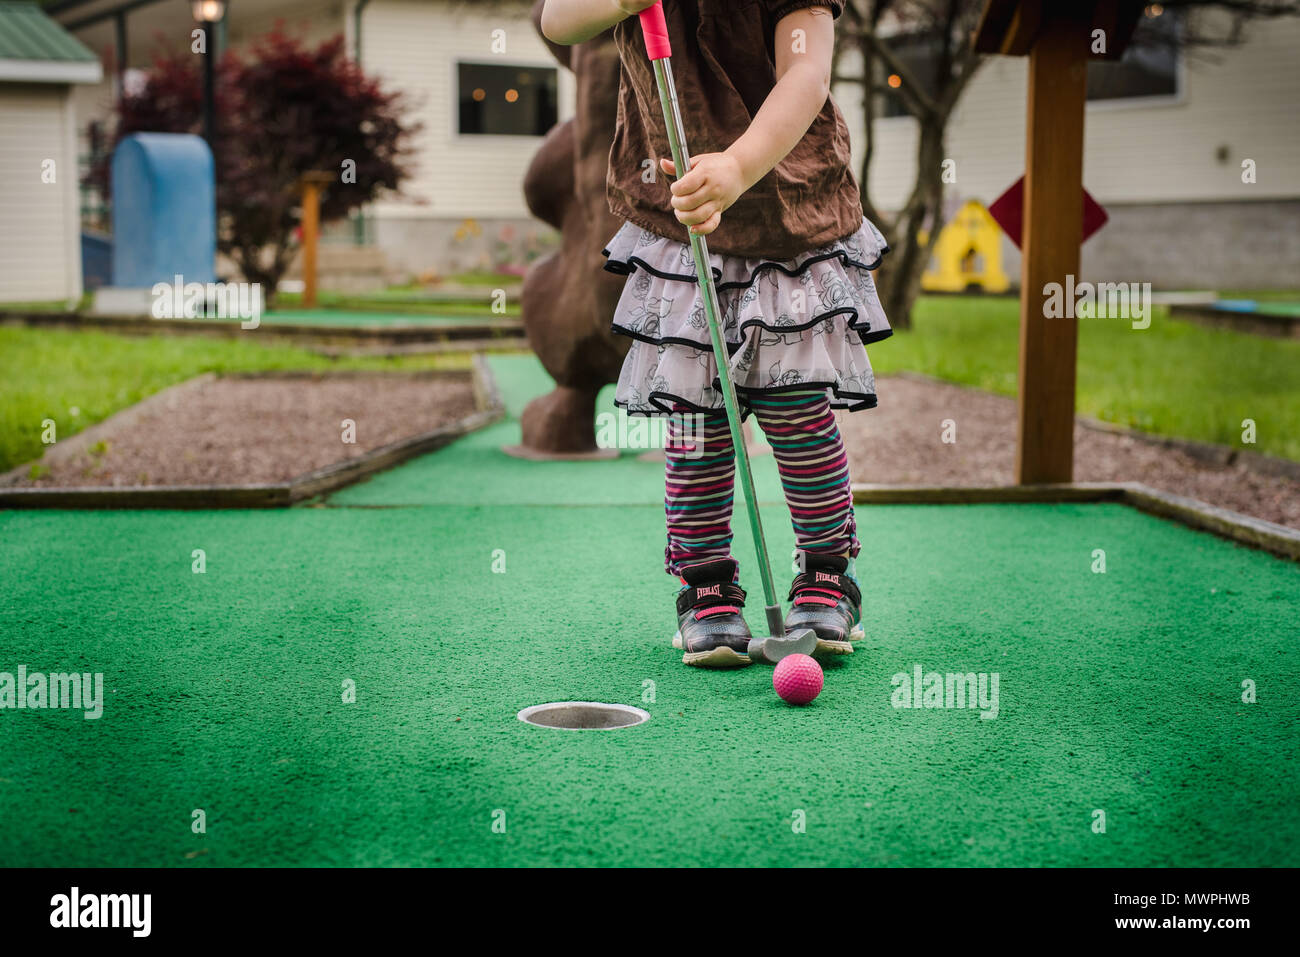 Una niña preescolar juega golf en miniatura. Imagen De Stock